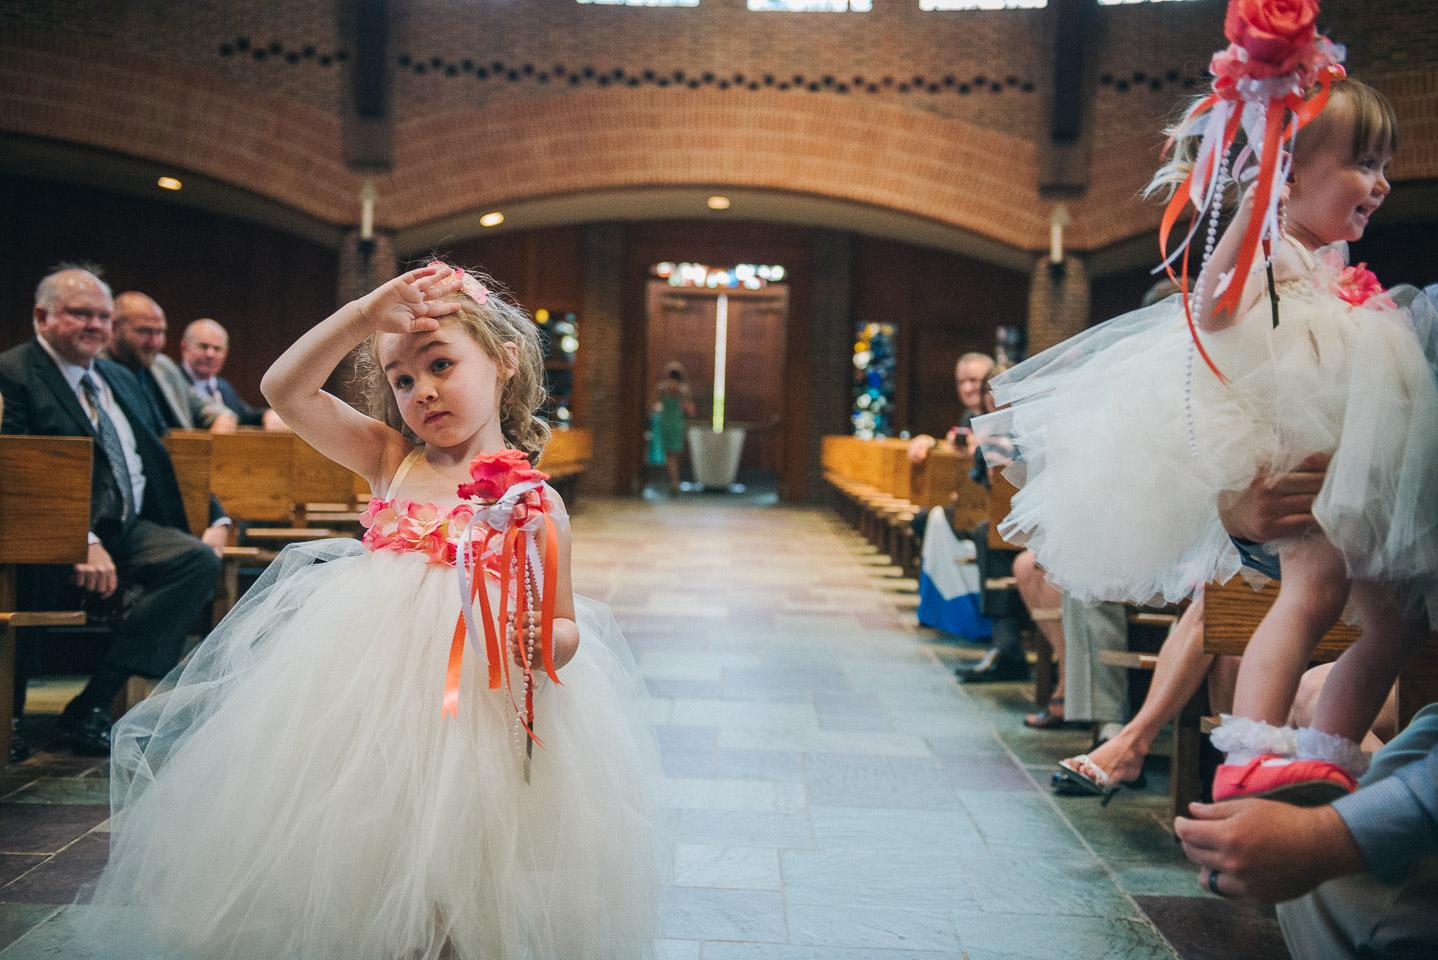 NH Wedding Photographer: processional flower girl